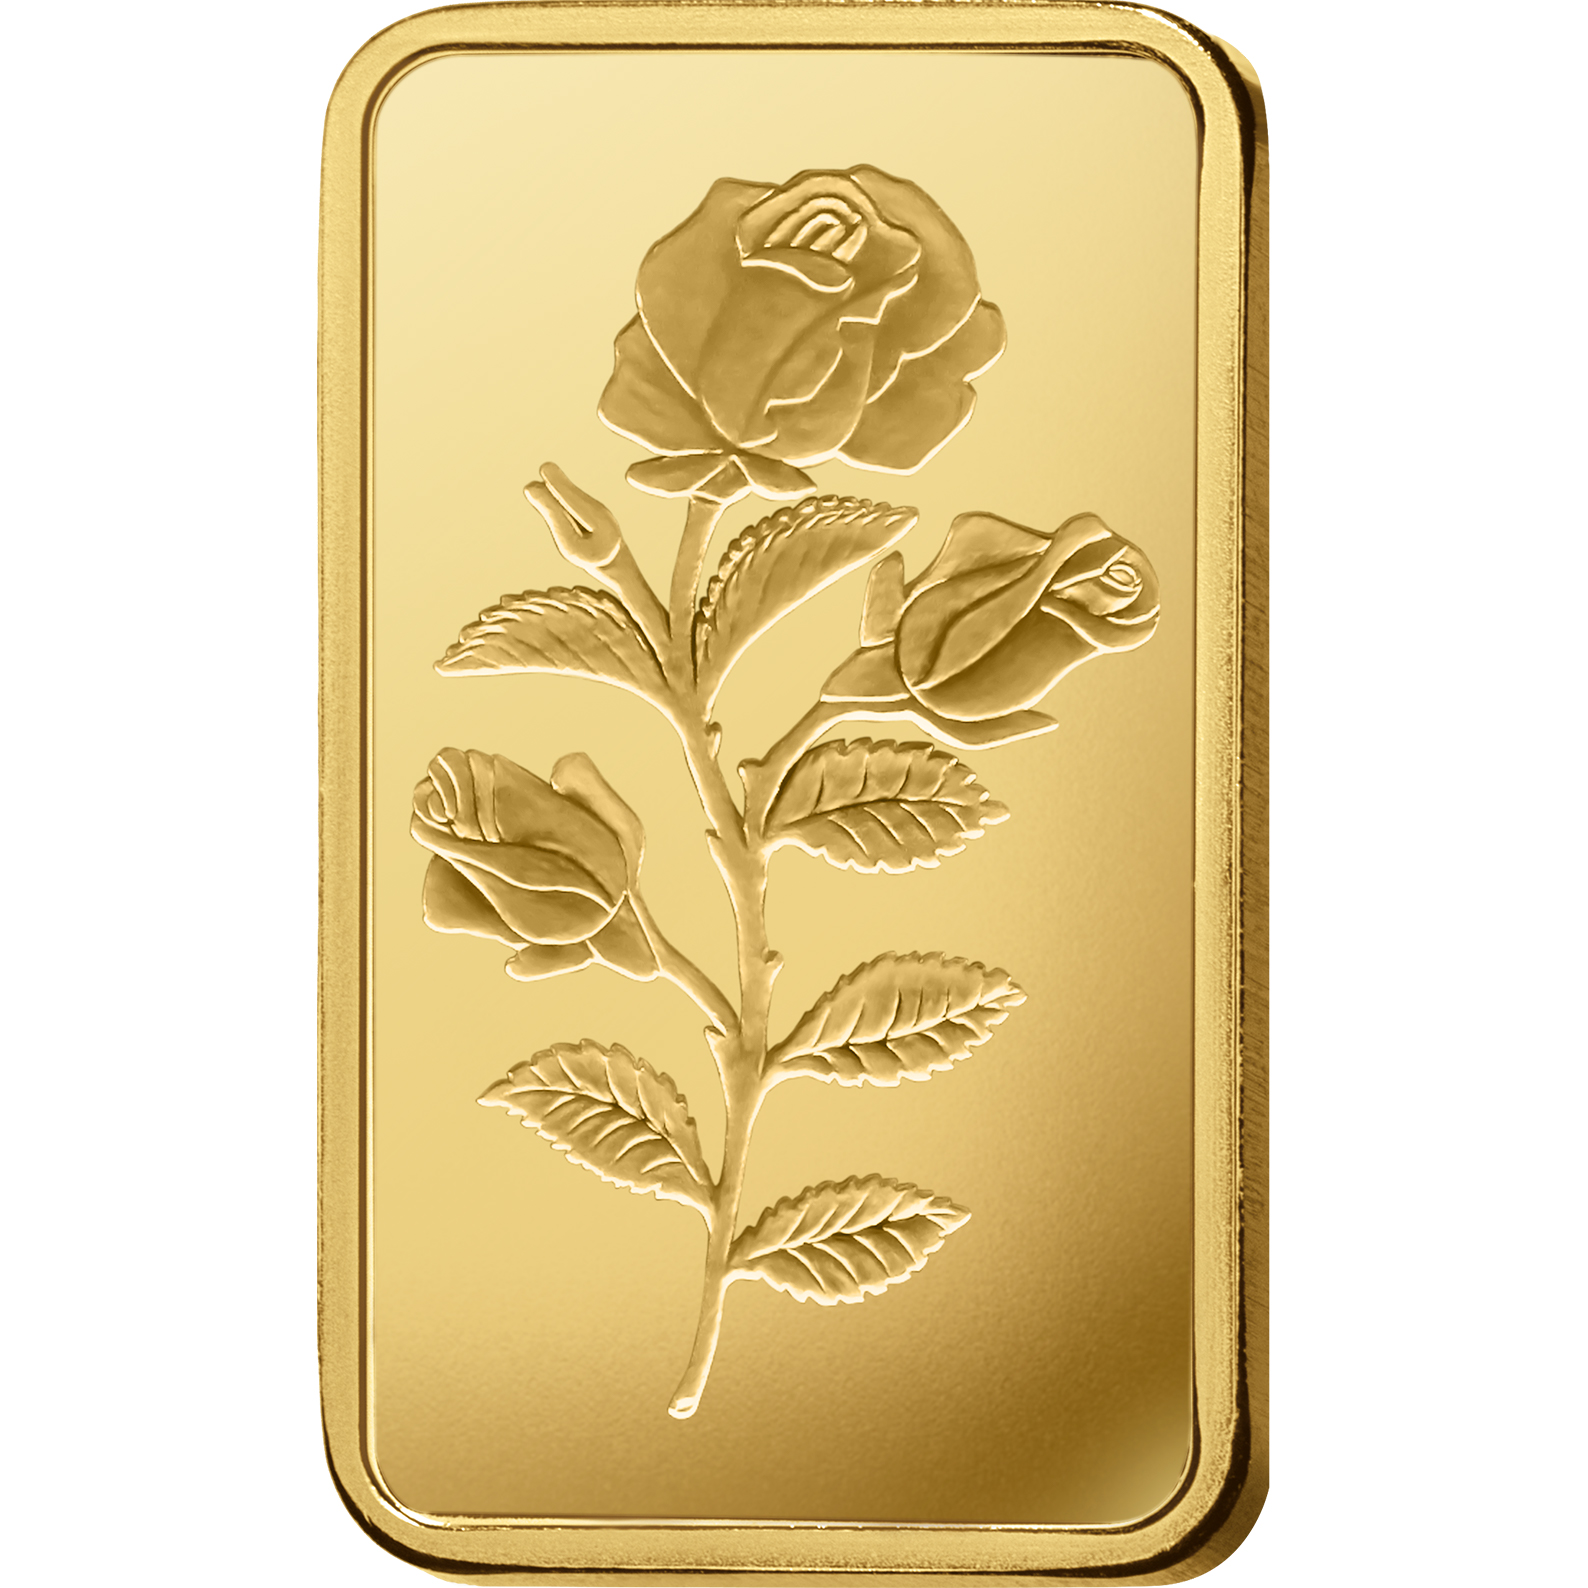 2,5 grammi lingottino d'oro - PAMP Suisse Rosa